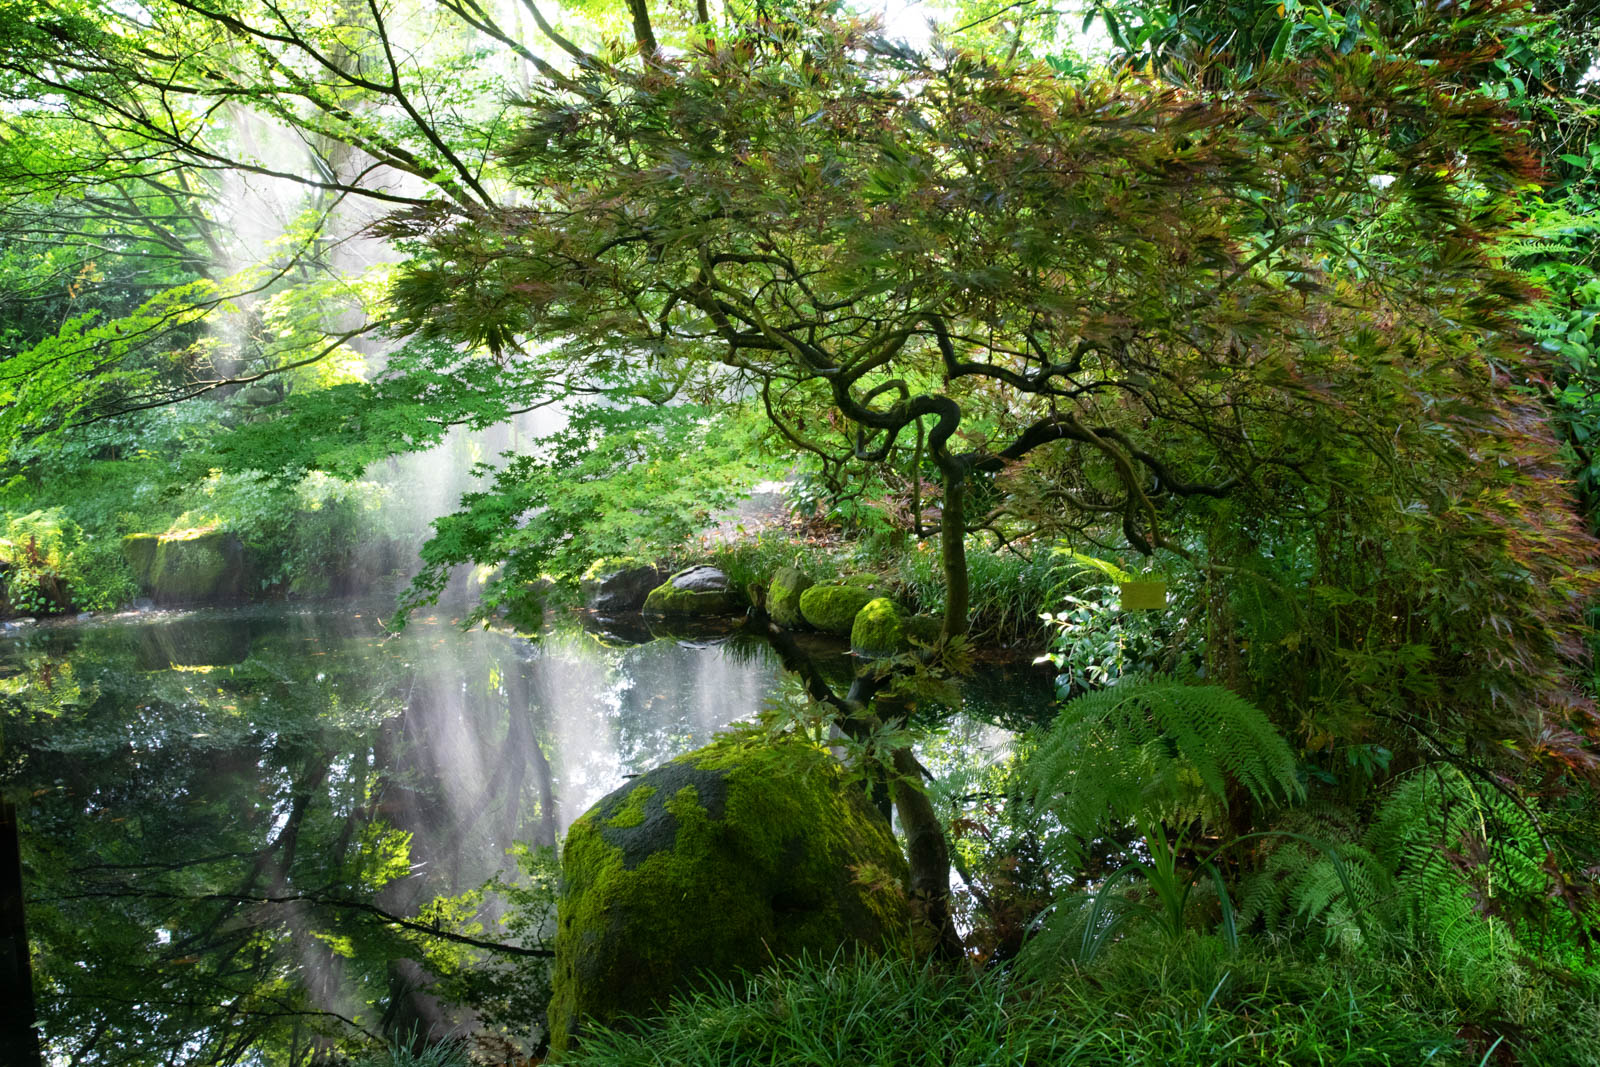 Botanischer Garten San Francisco, japanischer Garten, Teich